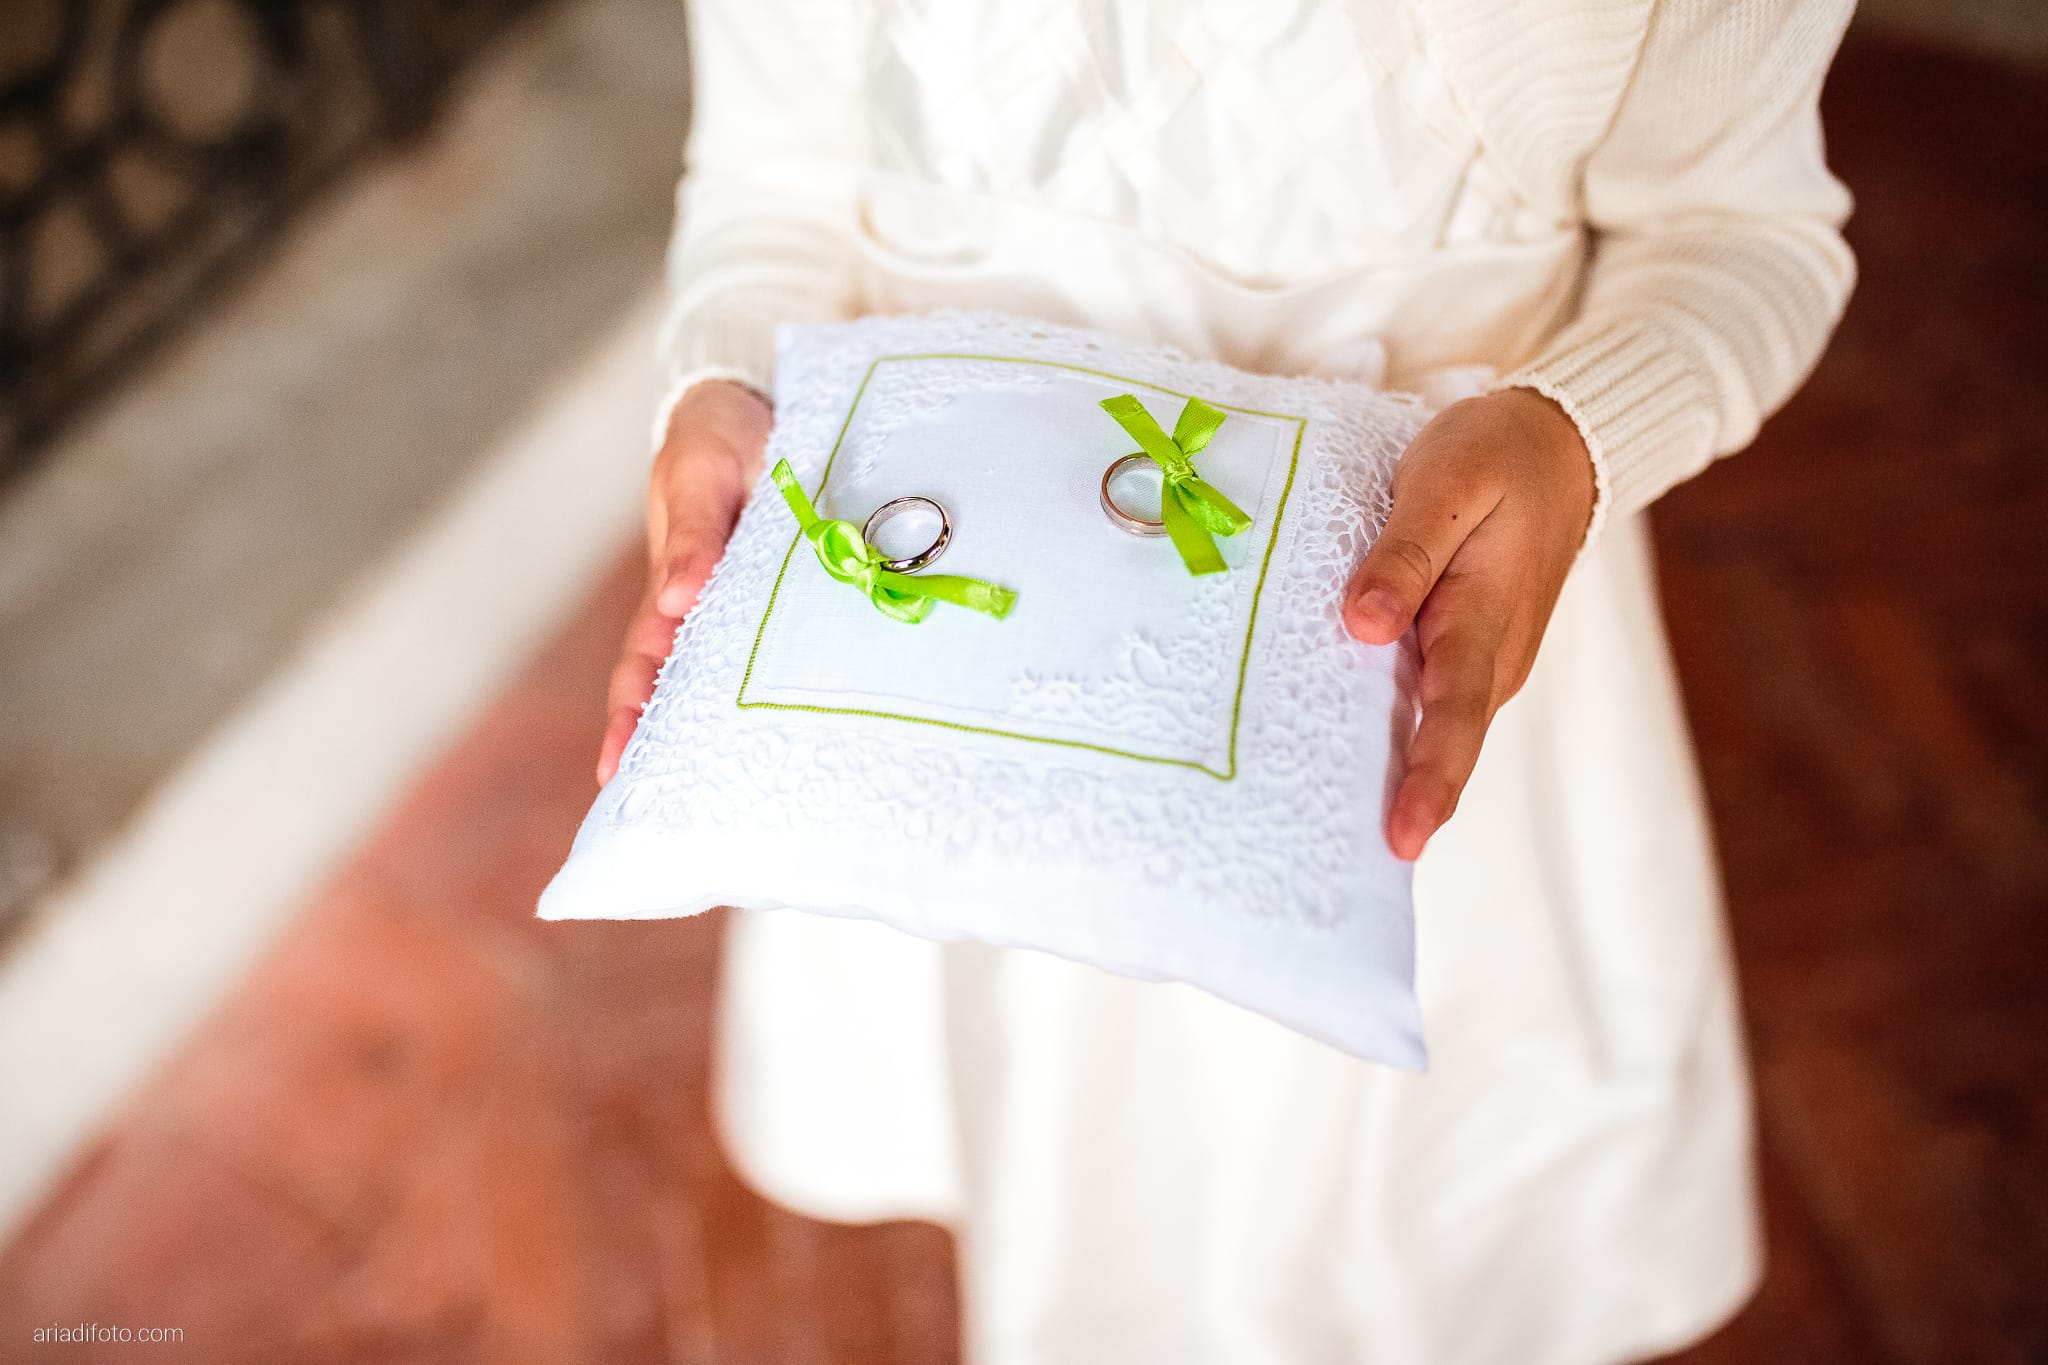 Eleonora Elia Matrimonio Chiesa Santa Eufemia Tarcento Udine Baronesse Tacco Gorizia cerimonia dettagli anelli